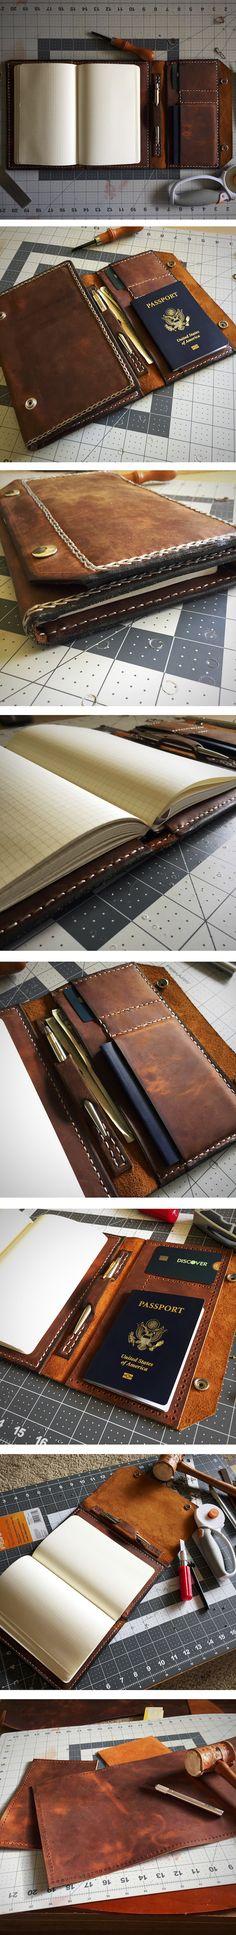 World Traveler Leather Cover #Etsy #Colinsbookshop #worldtravel